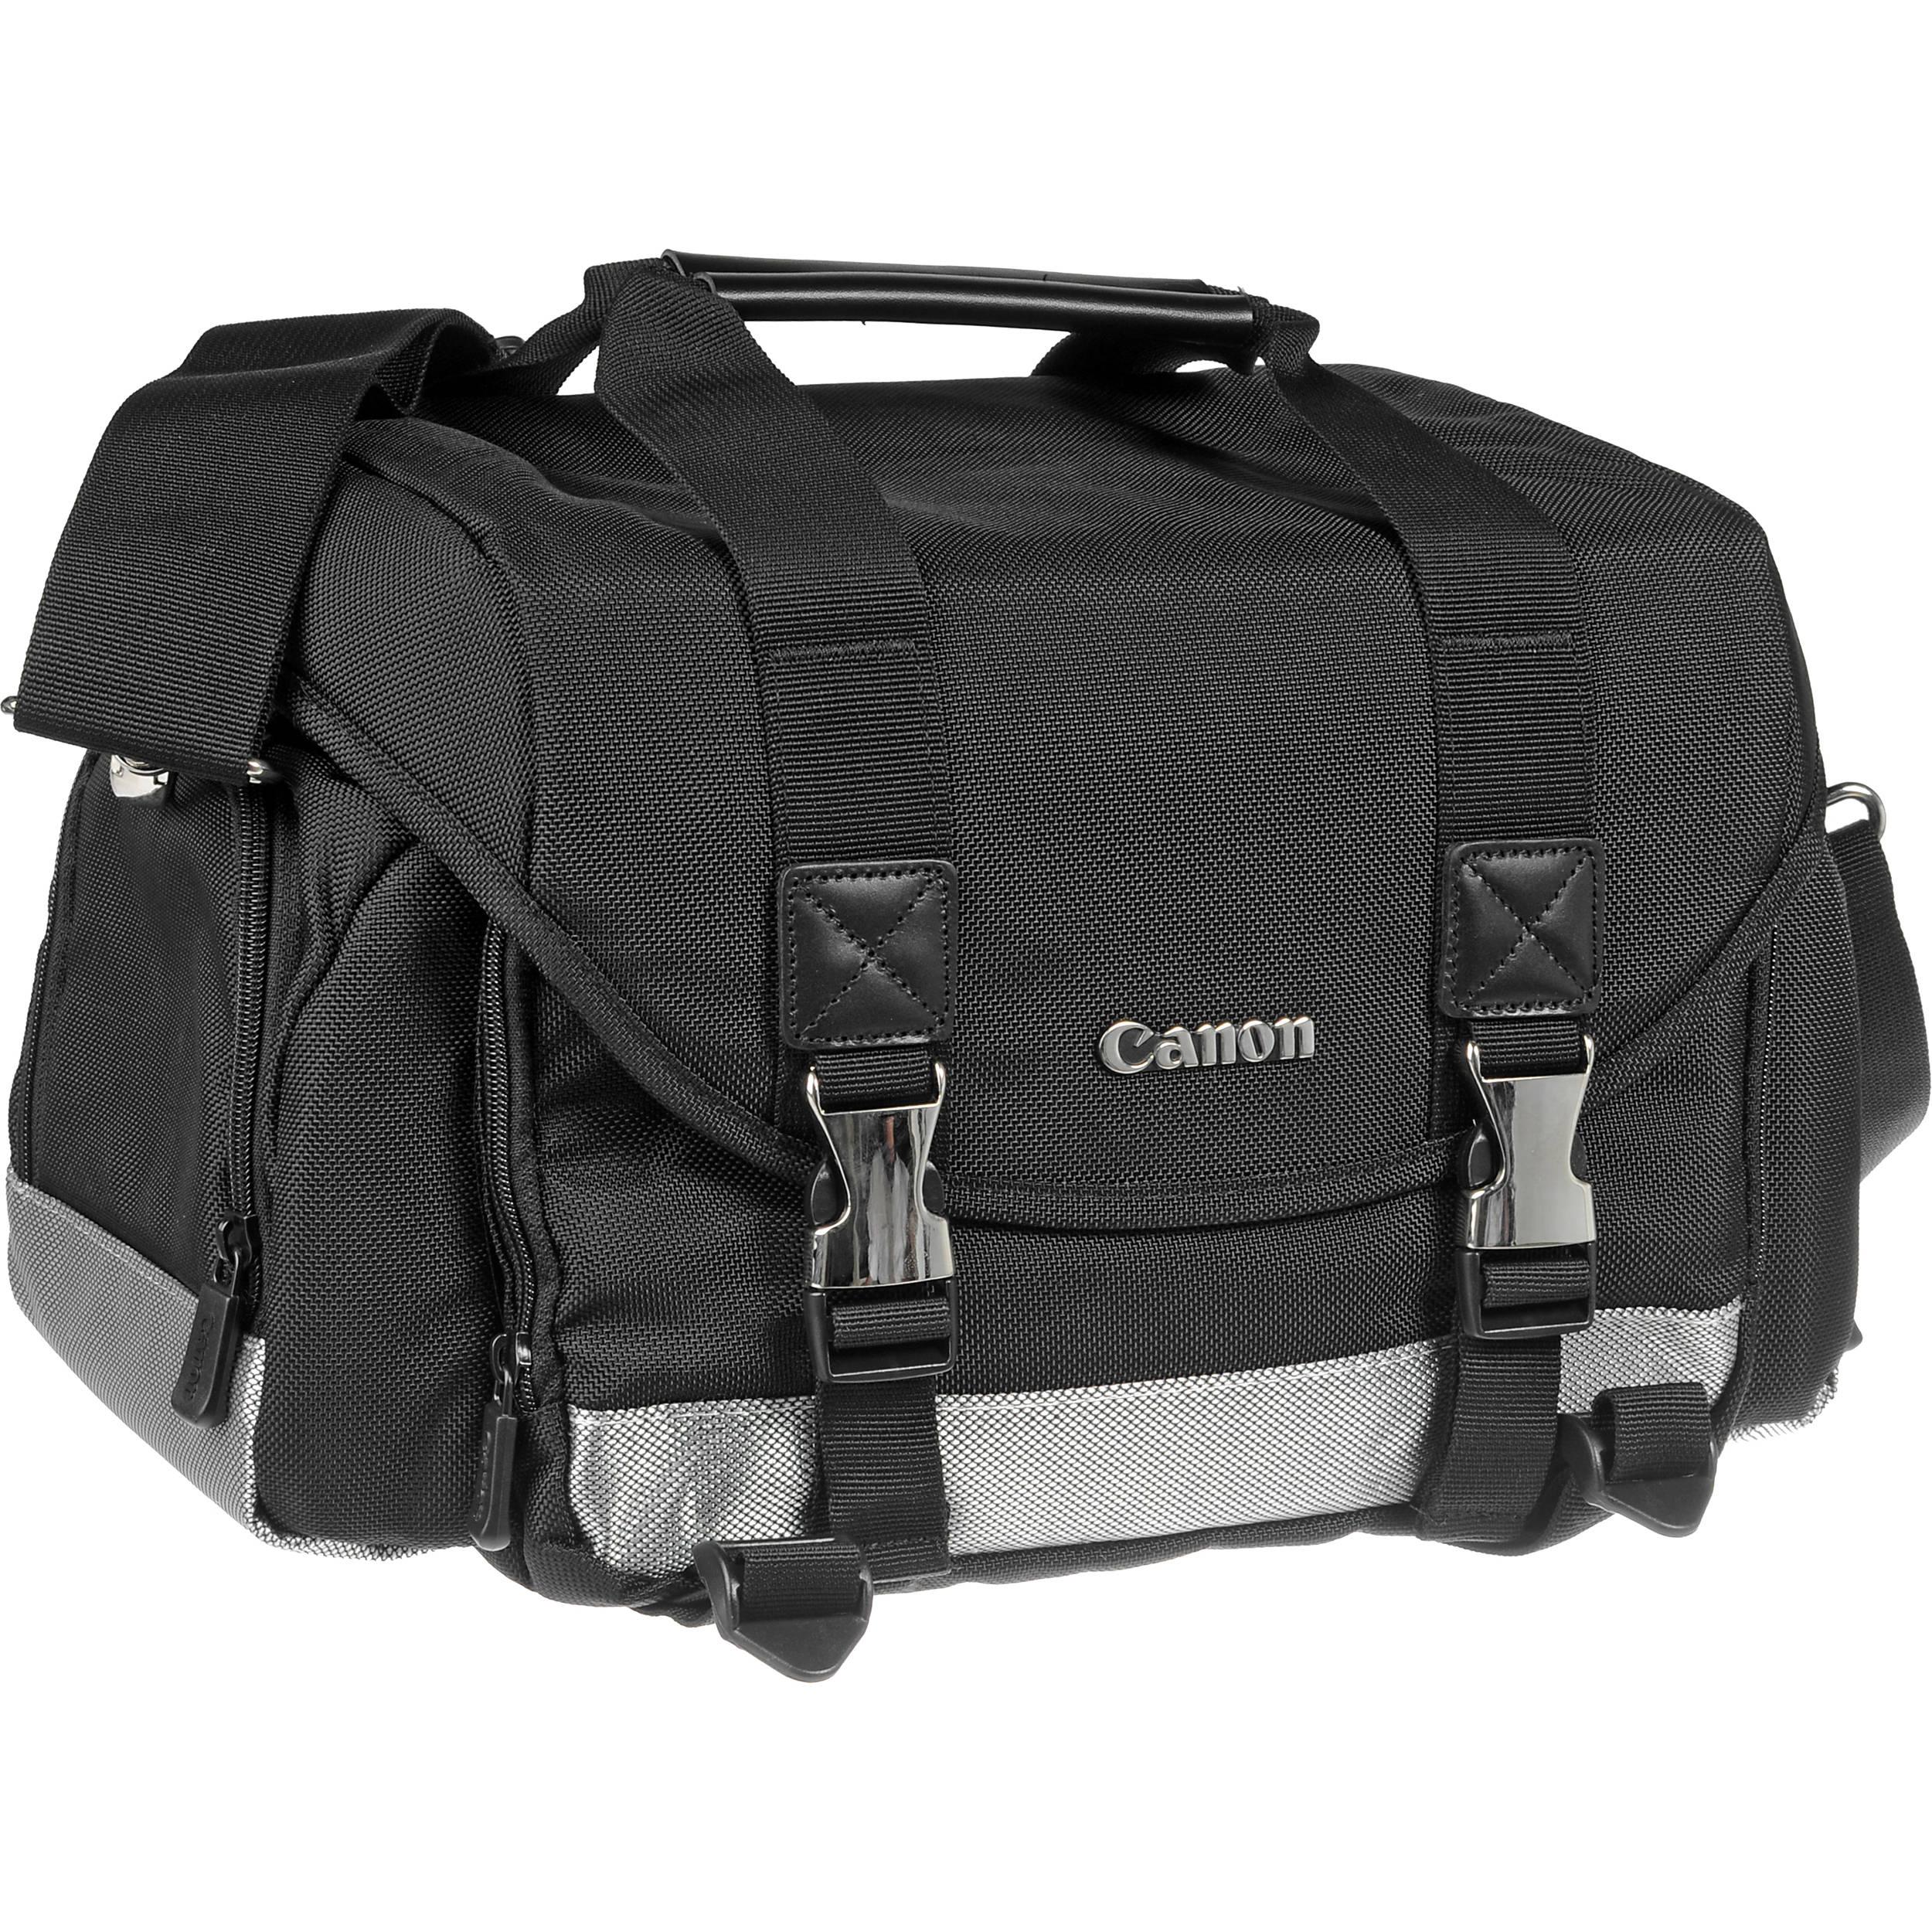 Camera Canon 20da Dslr Camera canon eos 20da dslr images guru a dg deluxe